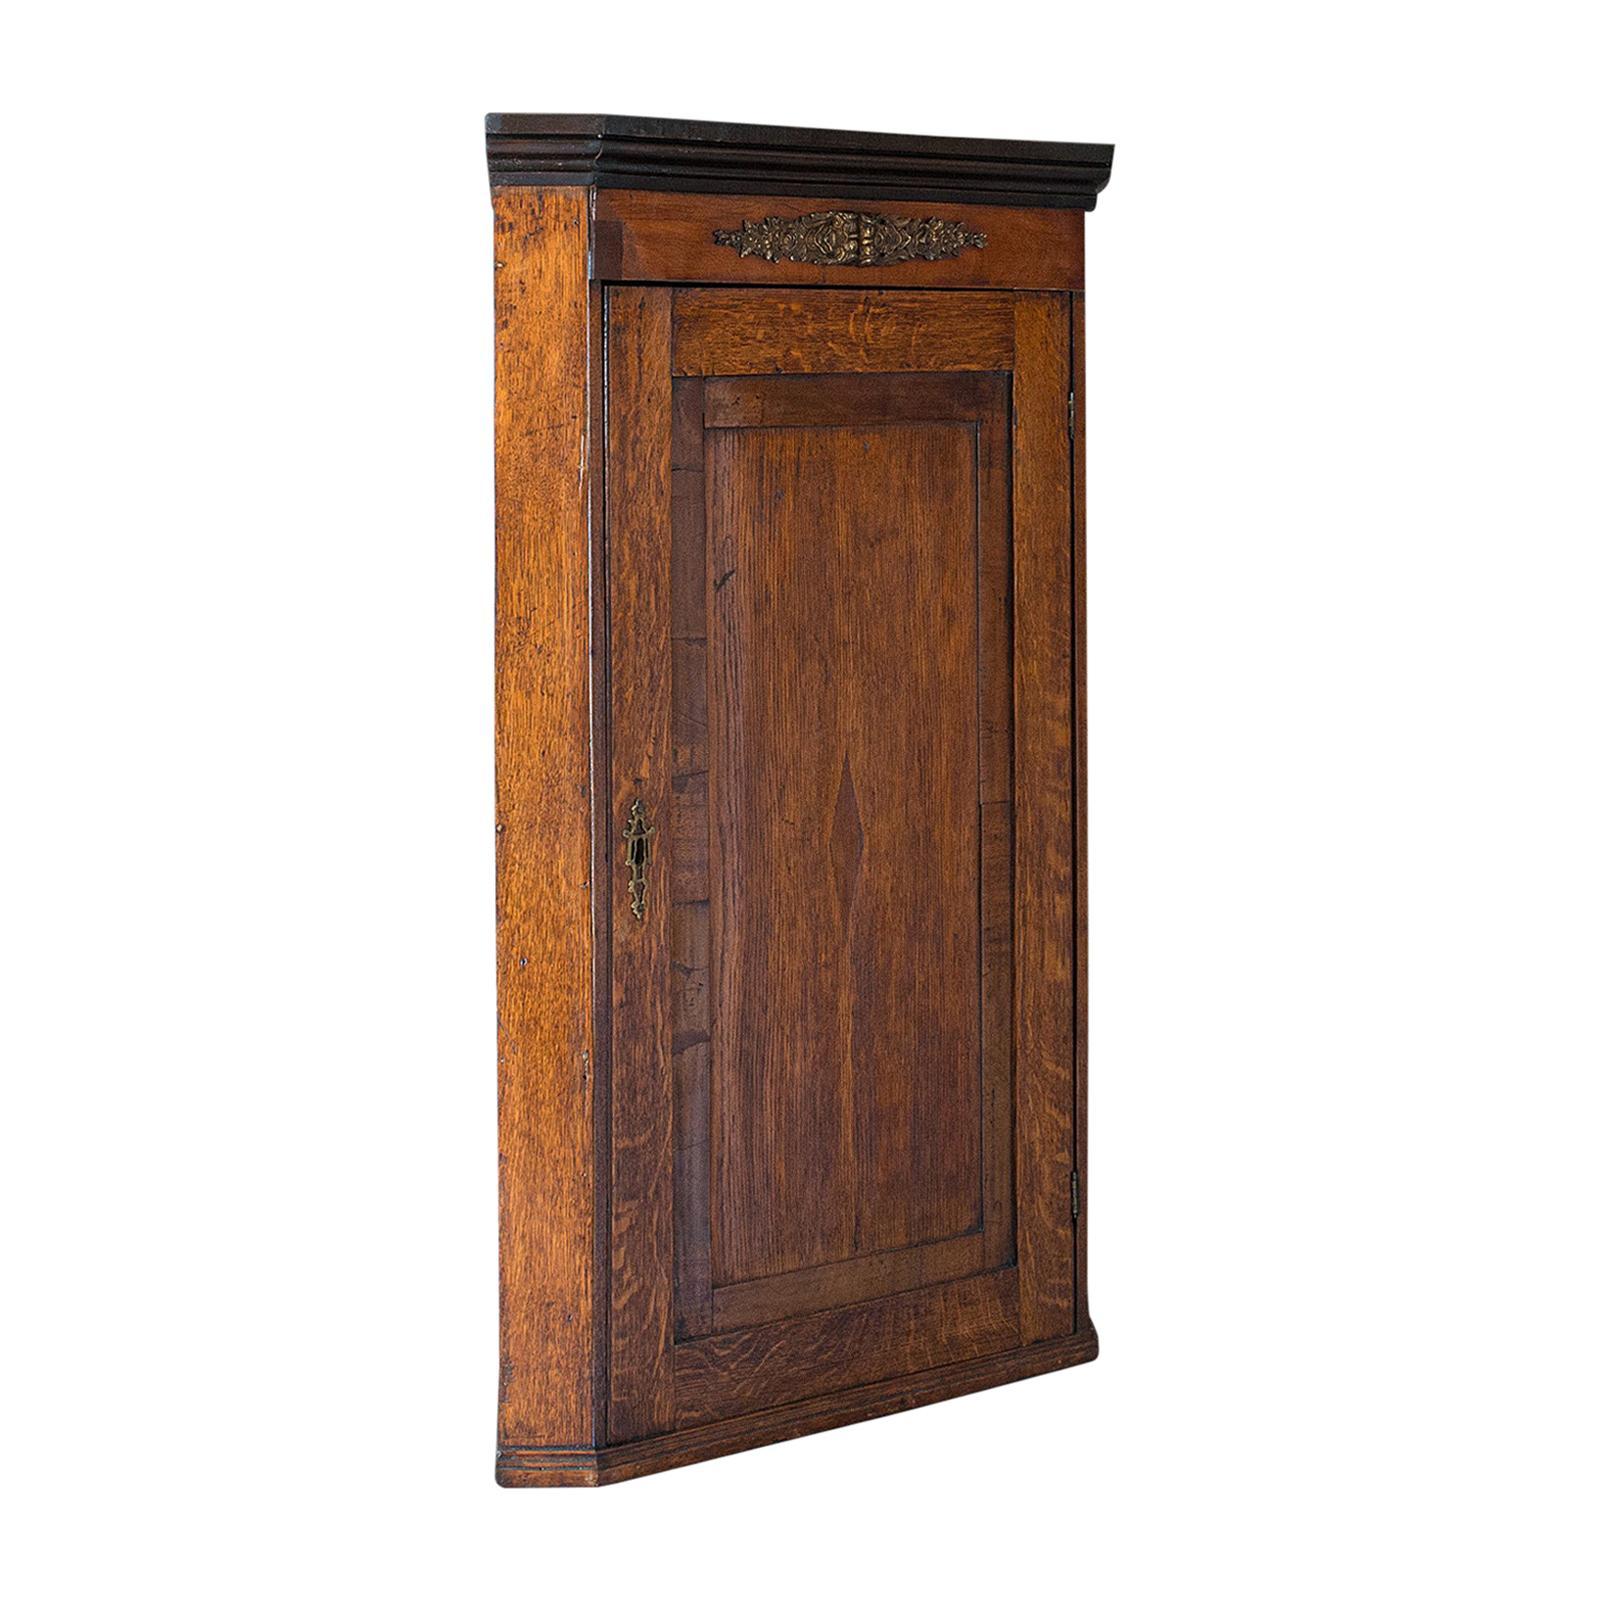 Antique Corner Cabinet, English, Oak, Mahogany, Georgian, Hanging Cupboard, 1800